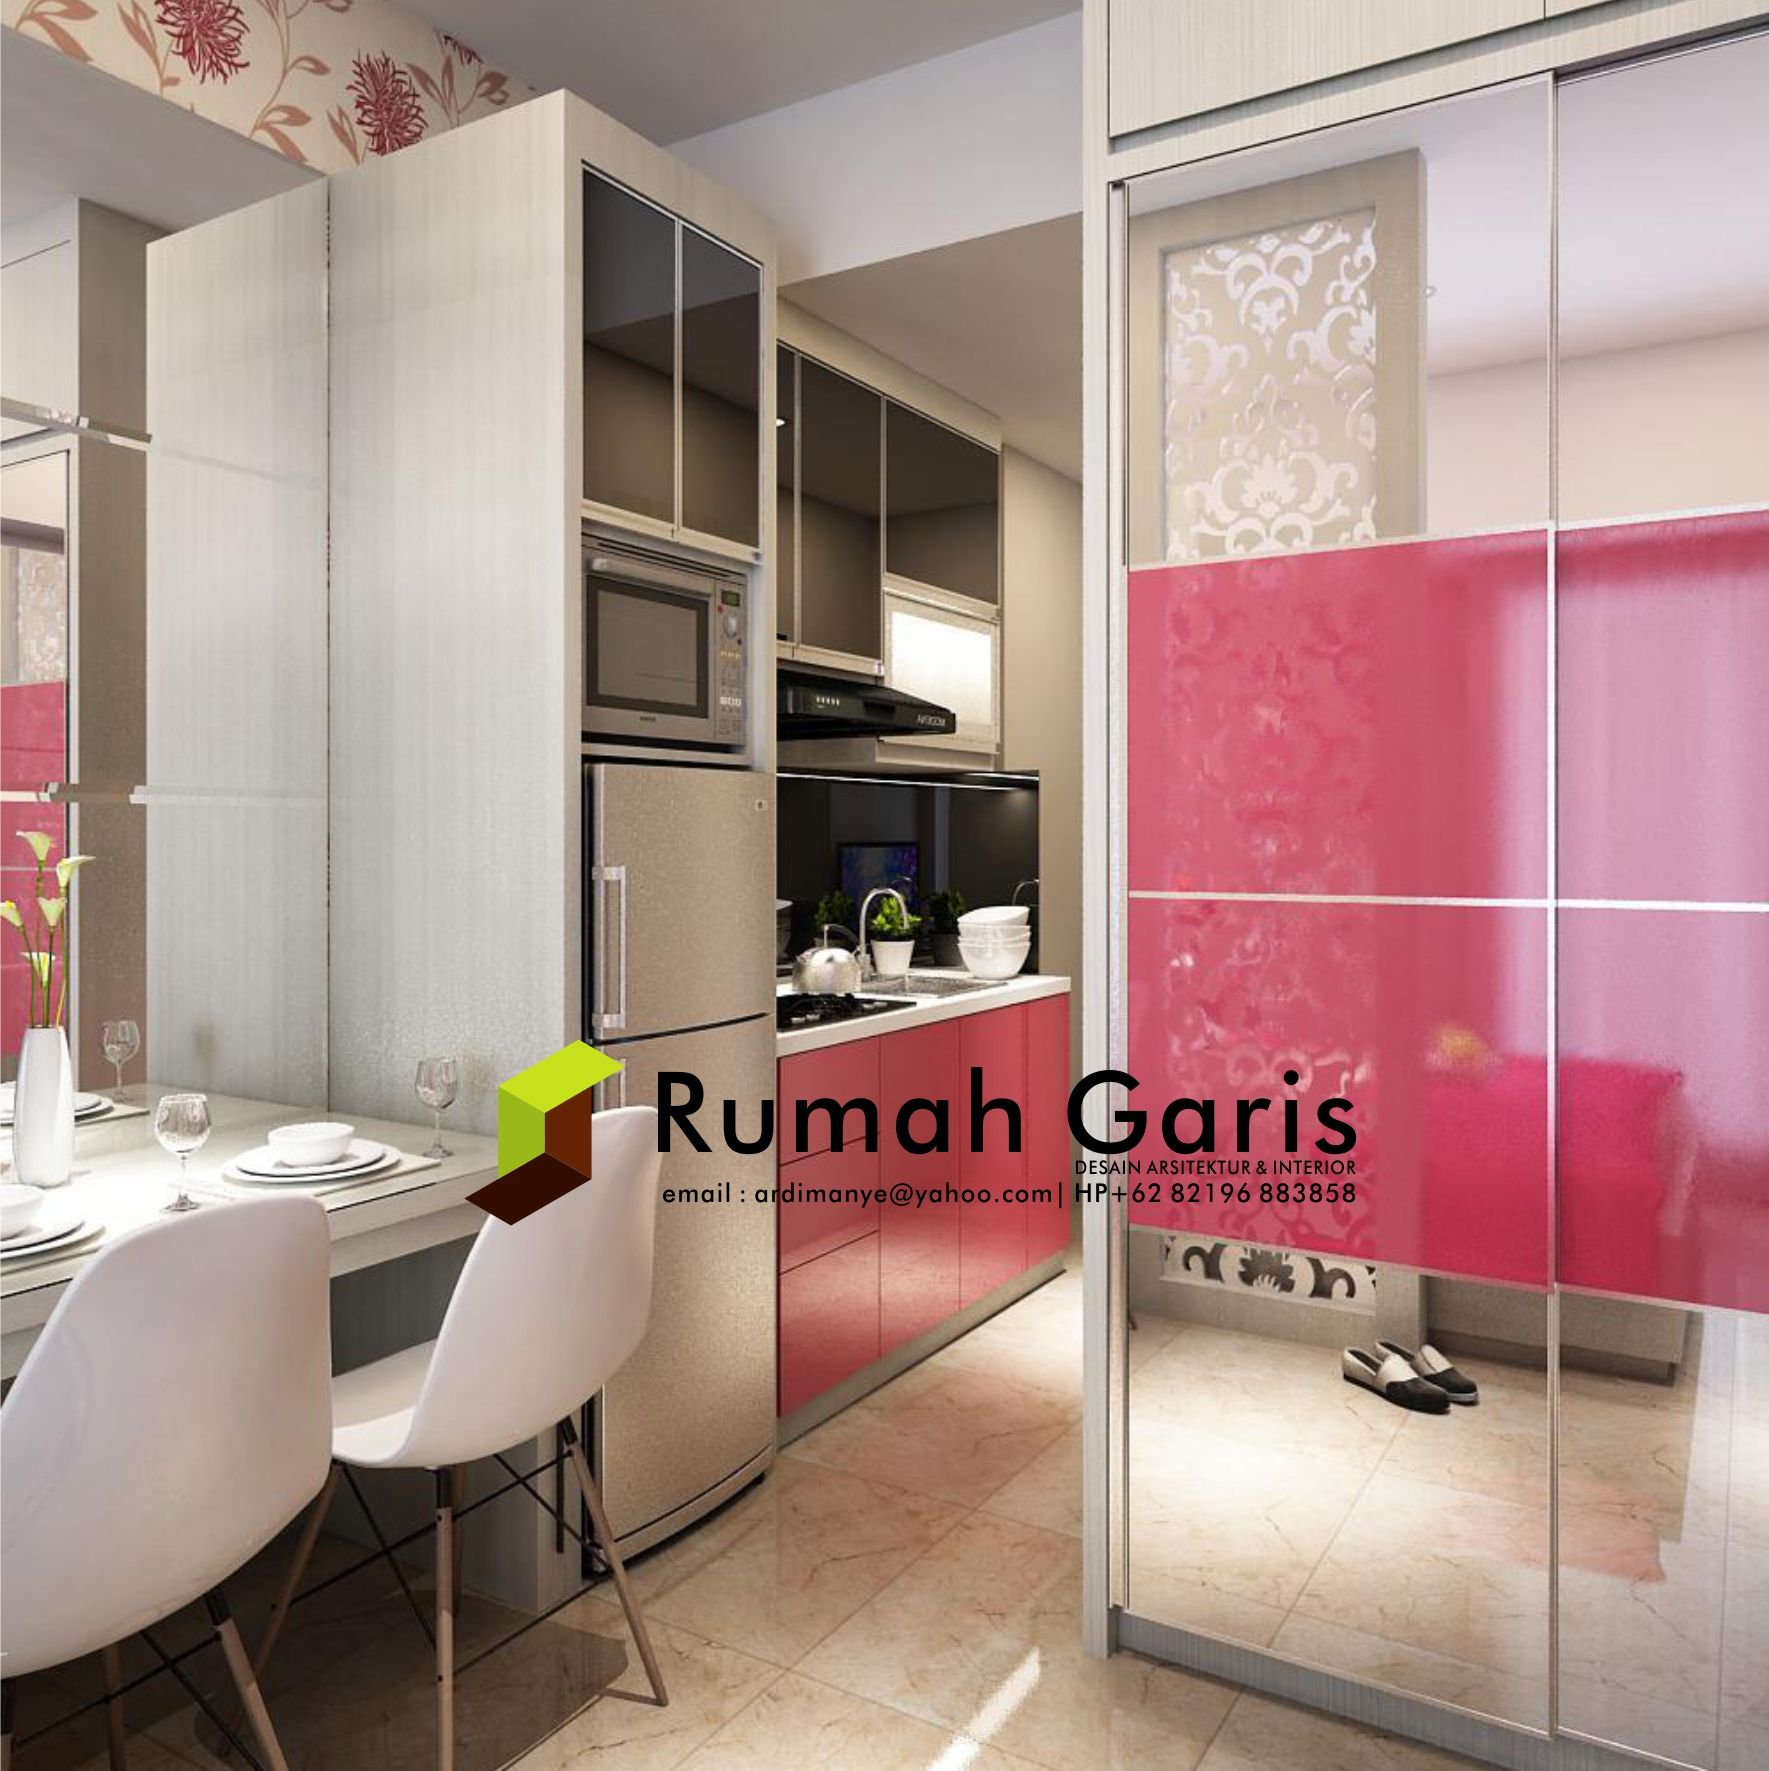 Desain Interior Kitchen Set Lemari Pakaian Apartemen Tipe Studio Jasarender Renderonline Render3d